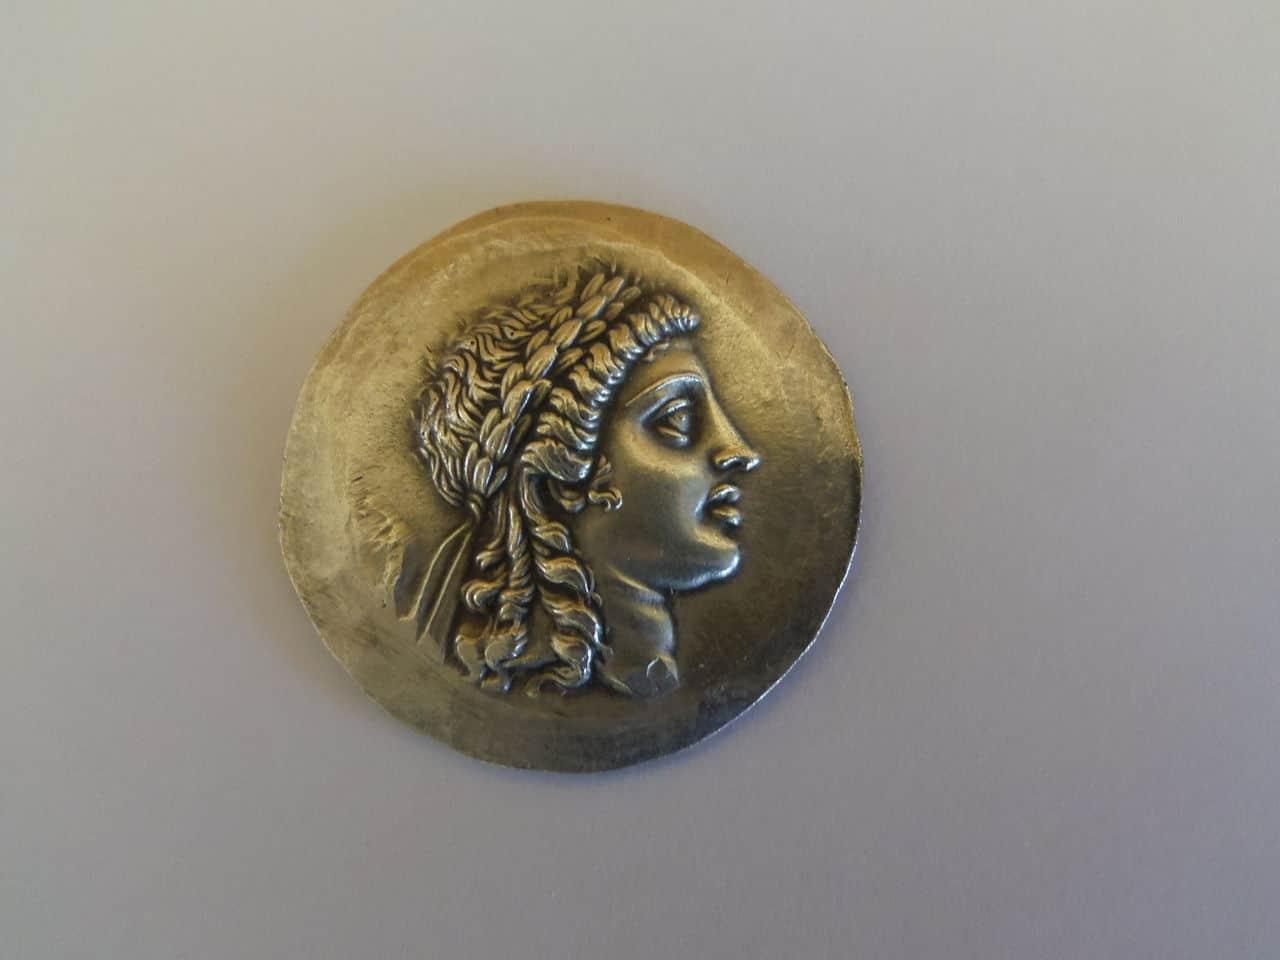 Tetradracma. Región de Aeolis, ceca Myrina. Reino de Pérgamo (155-145 a.C.) Anverso